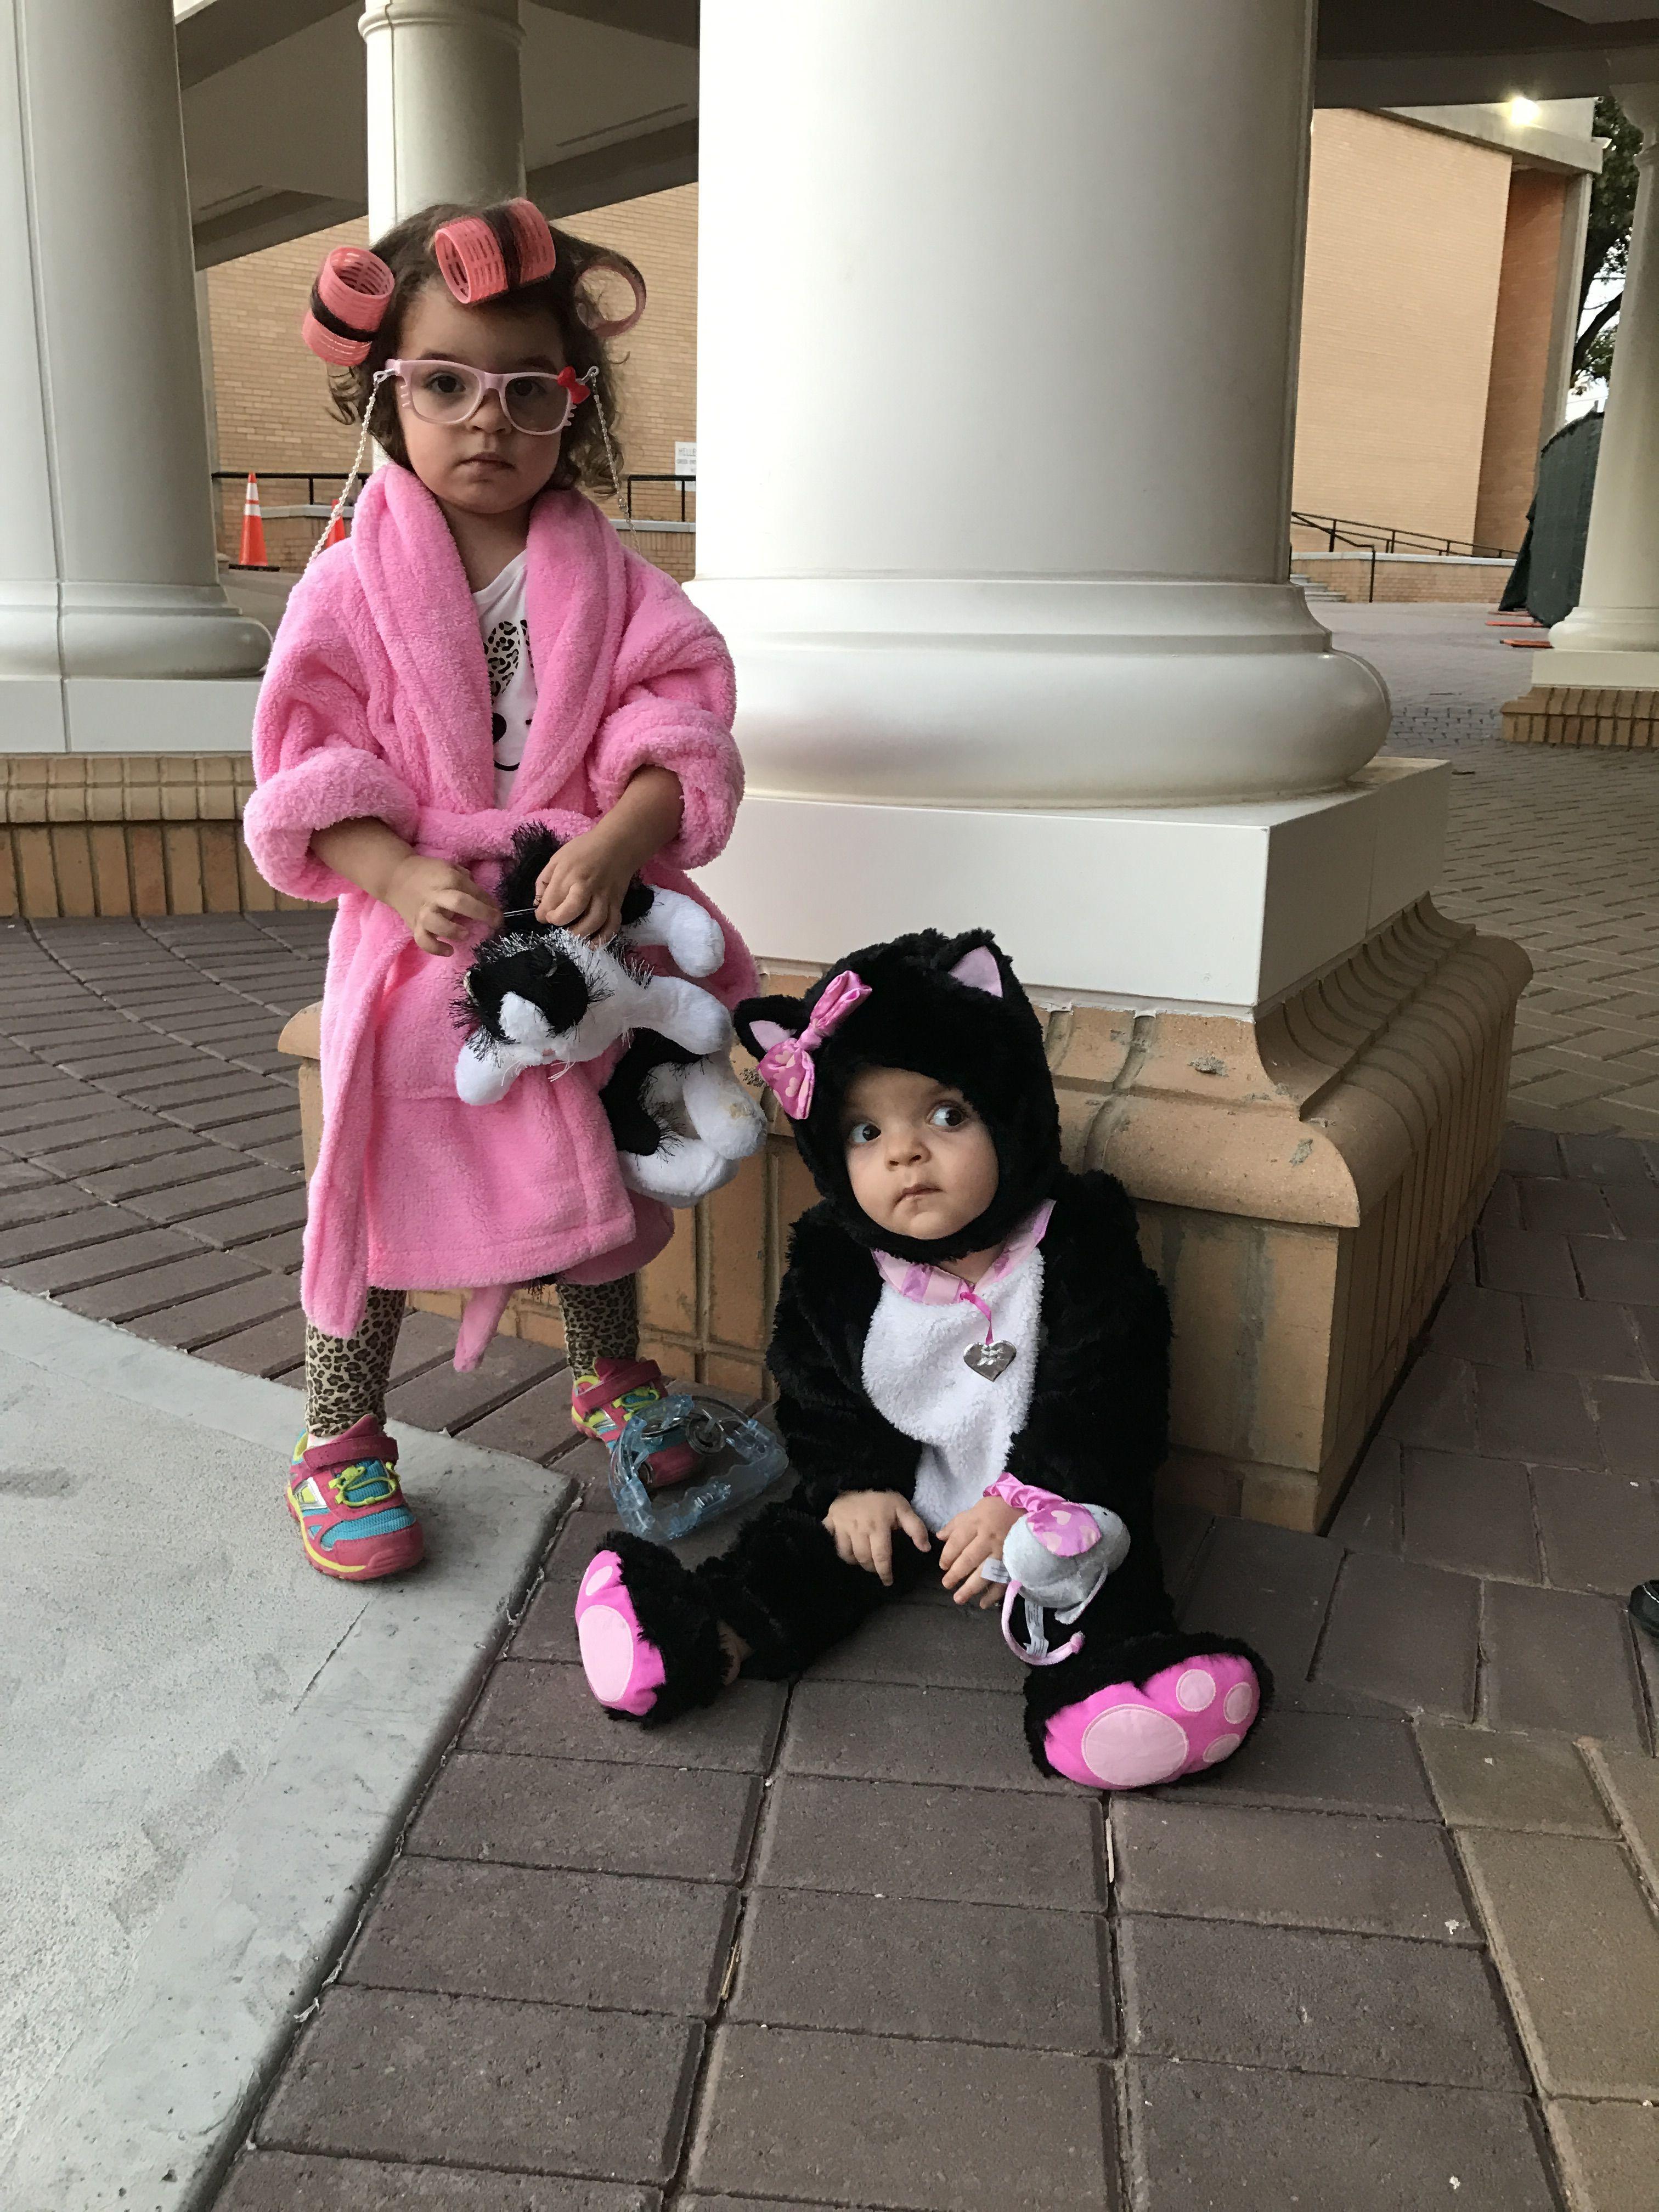 Pin By Elsa M M On Halloween Halloween Costumes For Sisters Costumes For Sisters Halloween Costume Toddler Girl